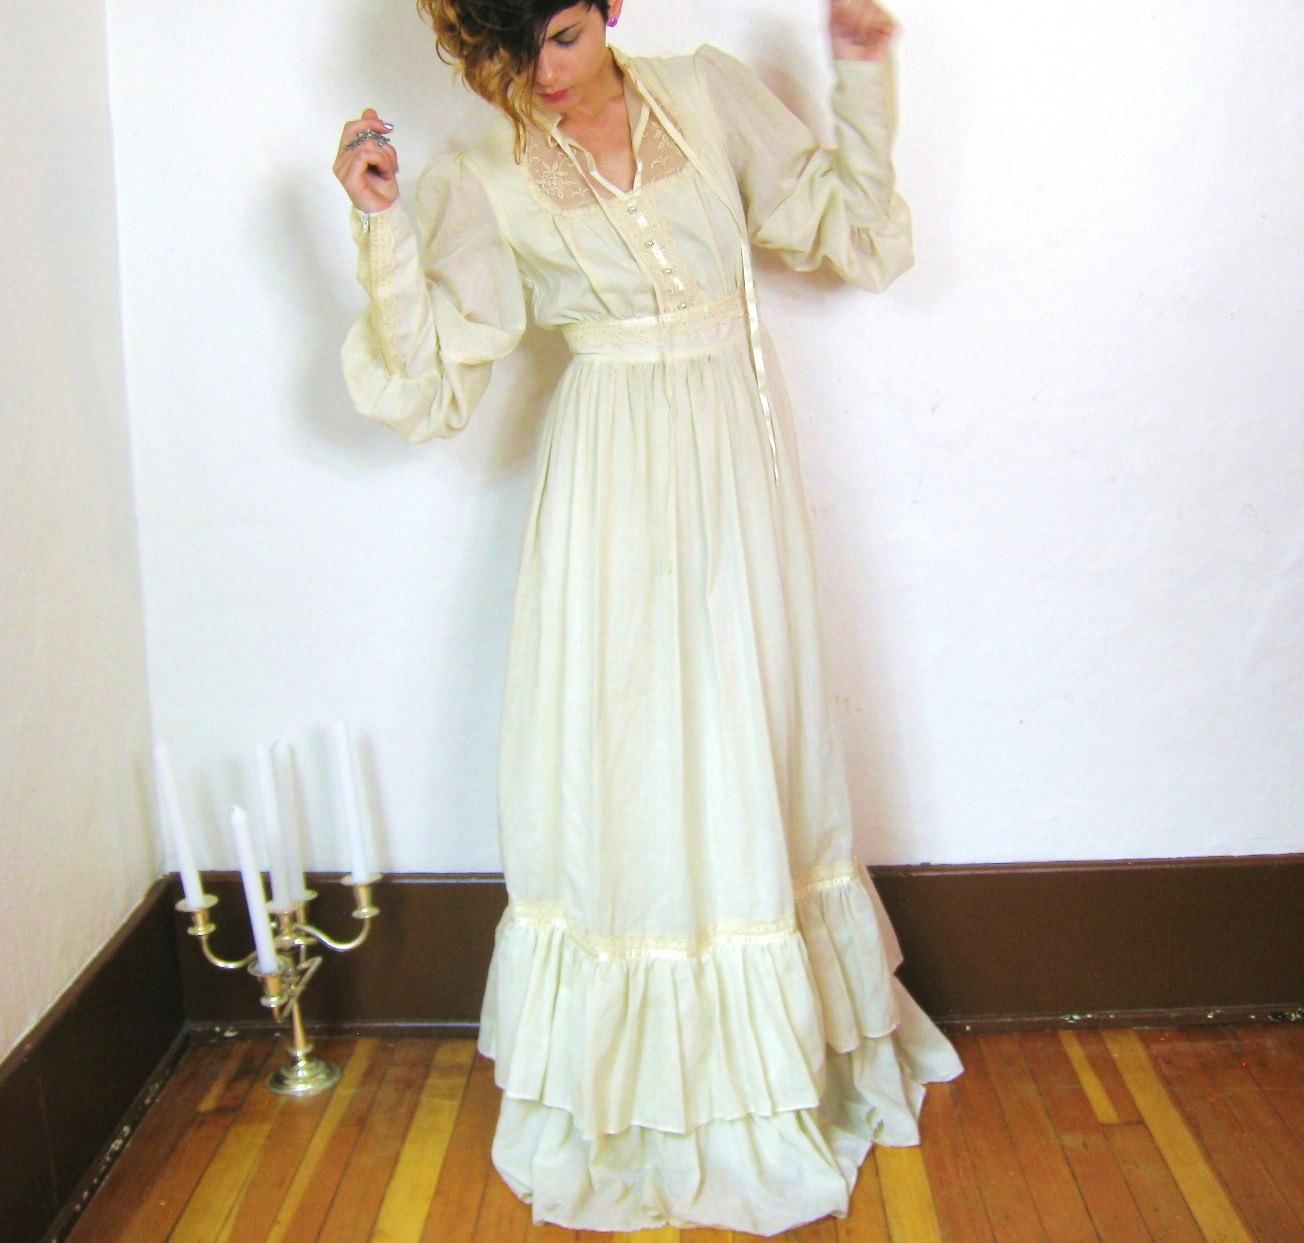 Peasant Dress Dressed Up Girl